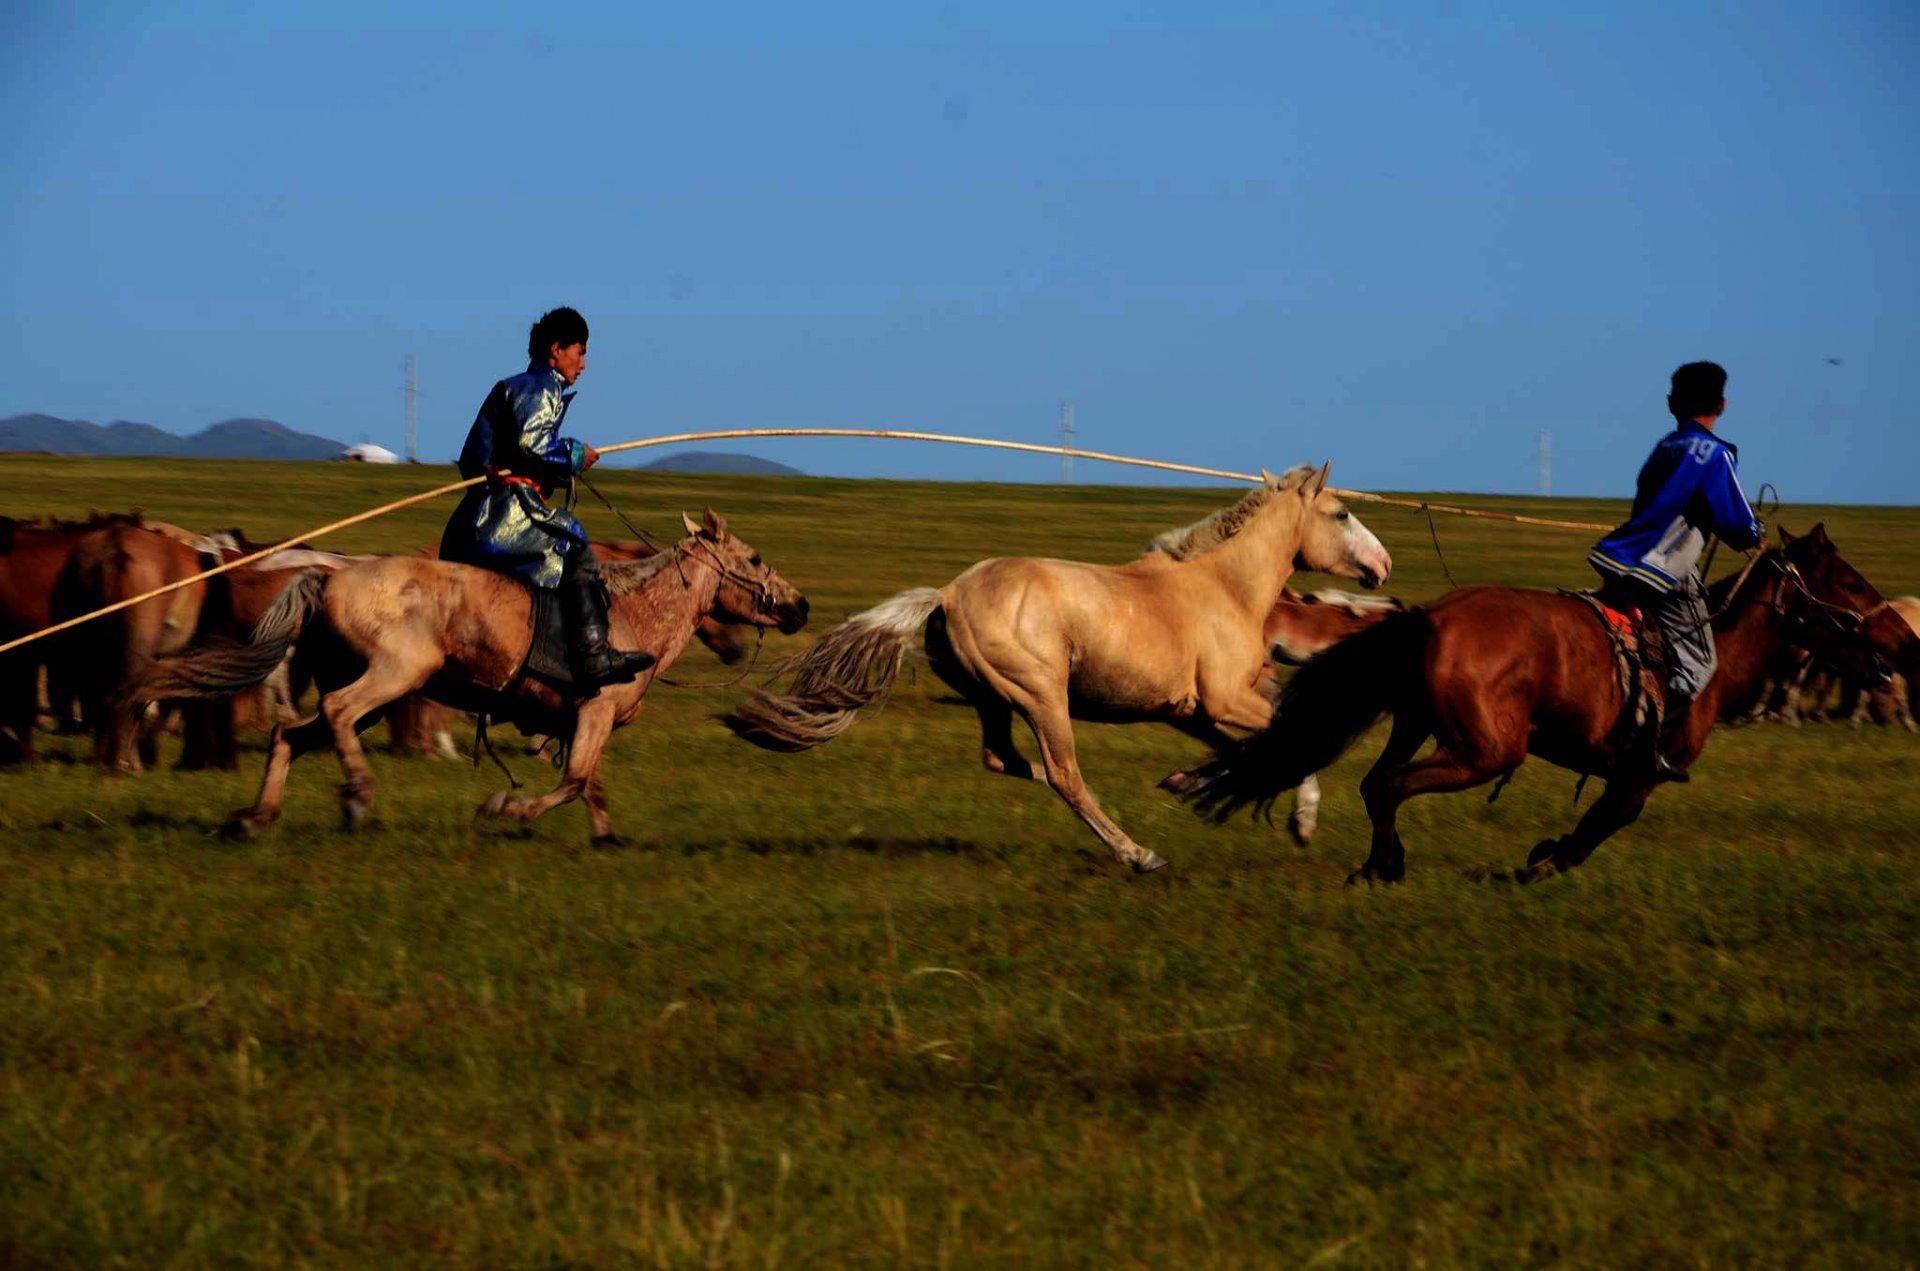 12 Reasons to visit Mongolia